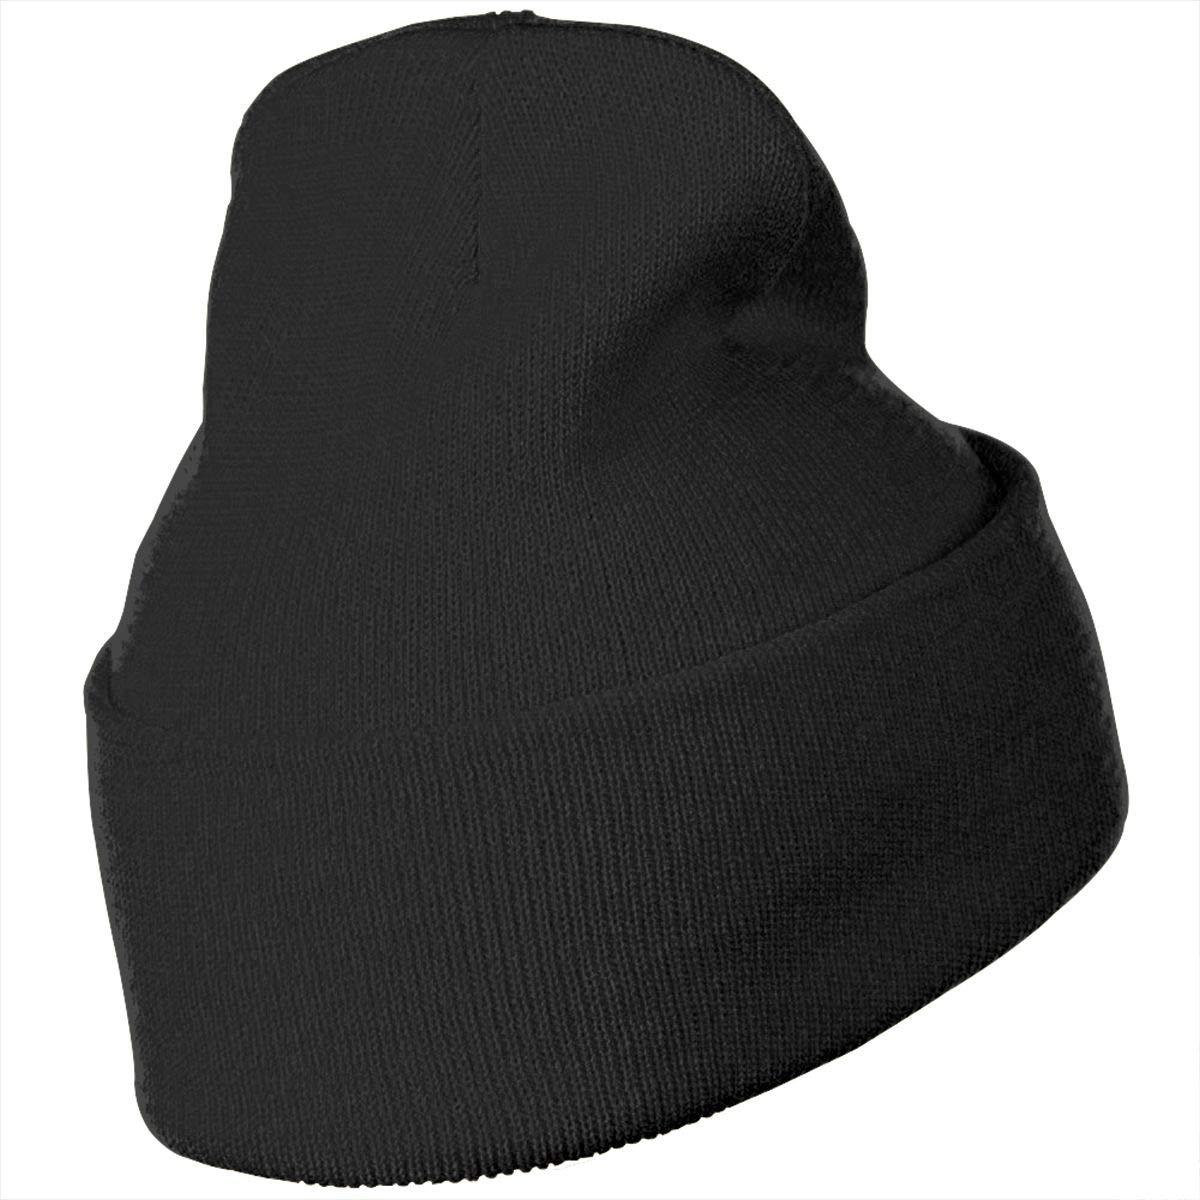 Giraffes Family Men /& Women Skull Caps Winter Warm Stretchy Knit Beanie Hats